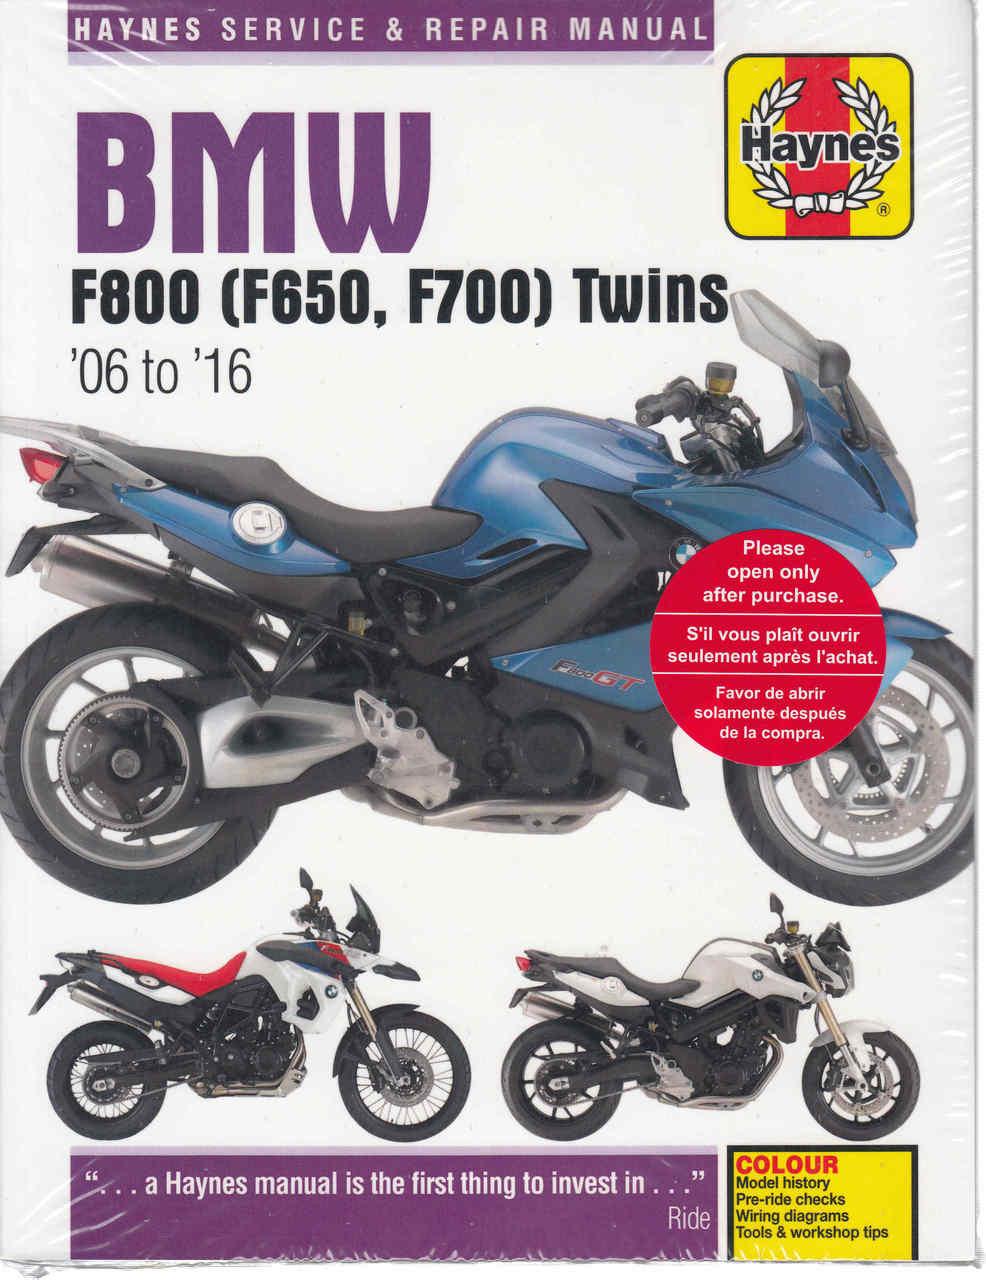 small resolution of bmw f800 f650 twins 2006 2016workshop manual 9780857339218